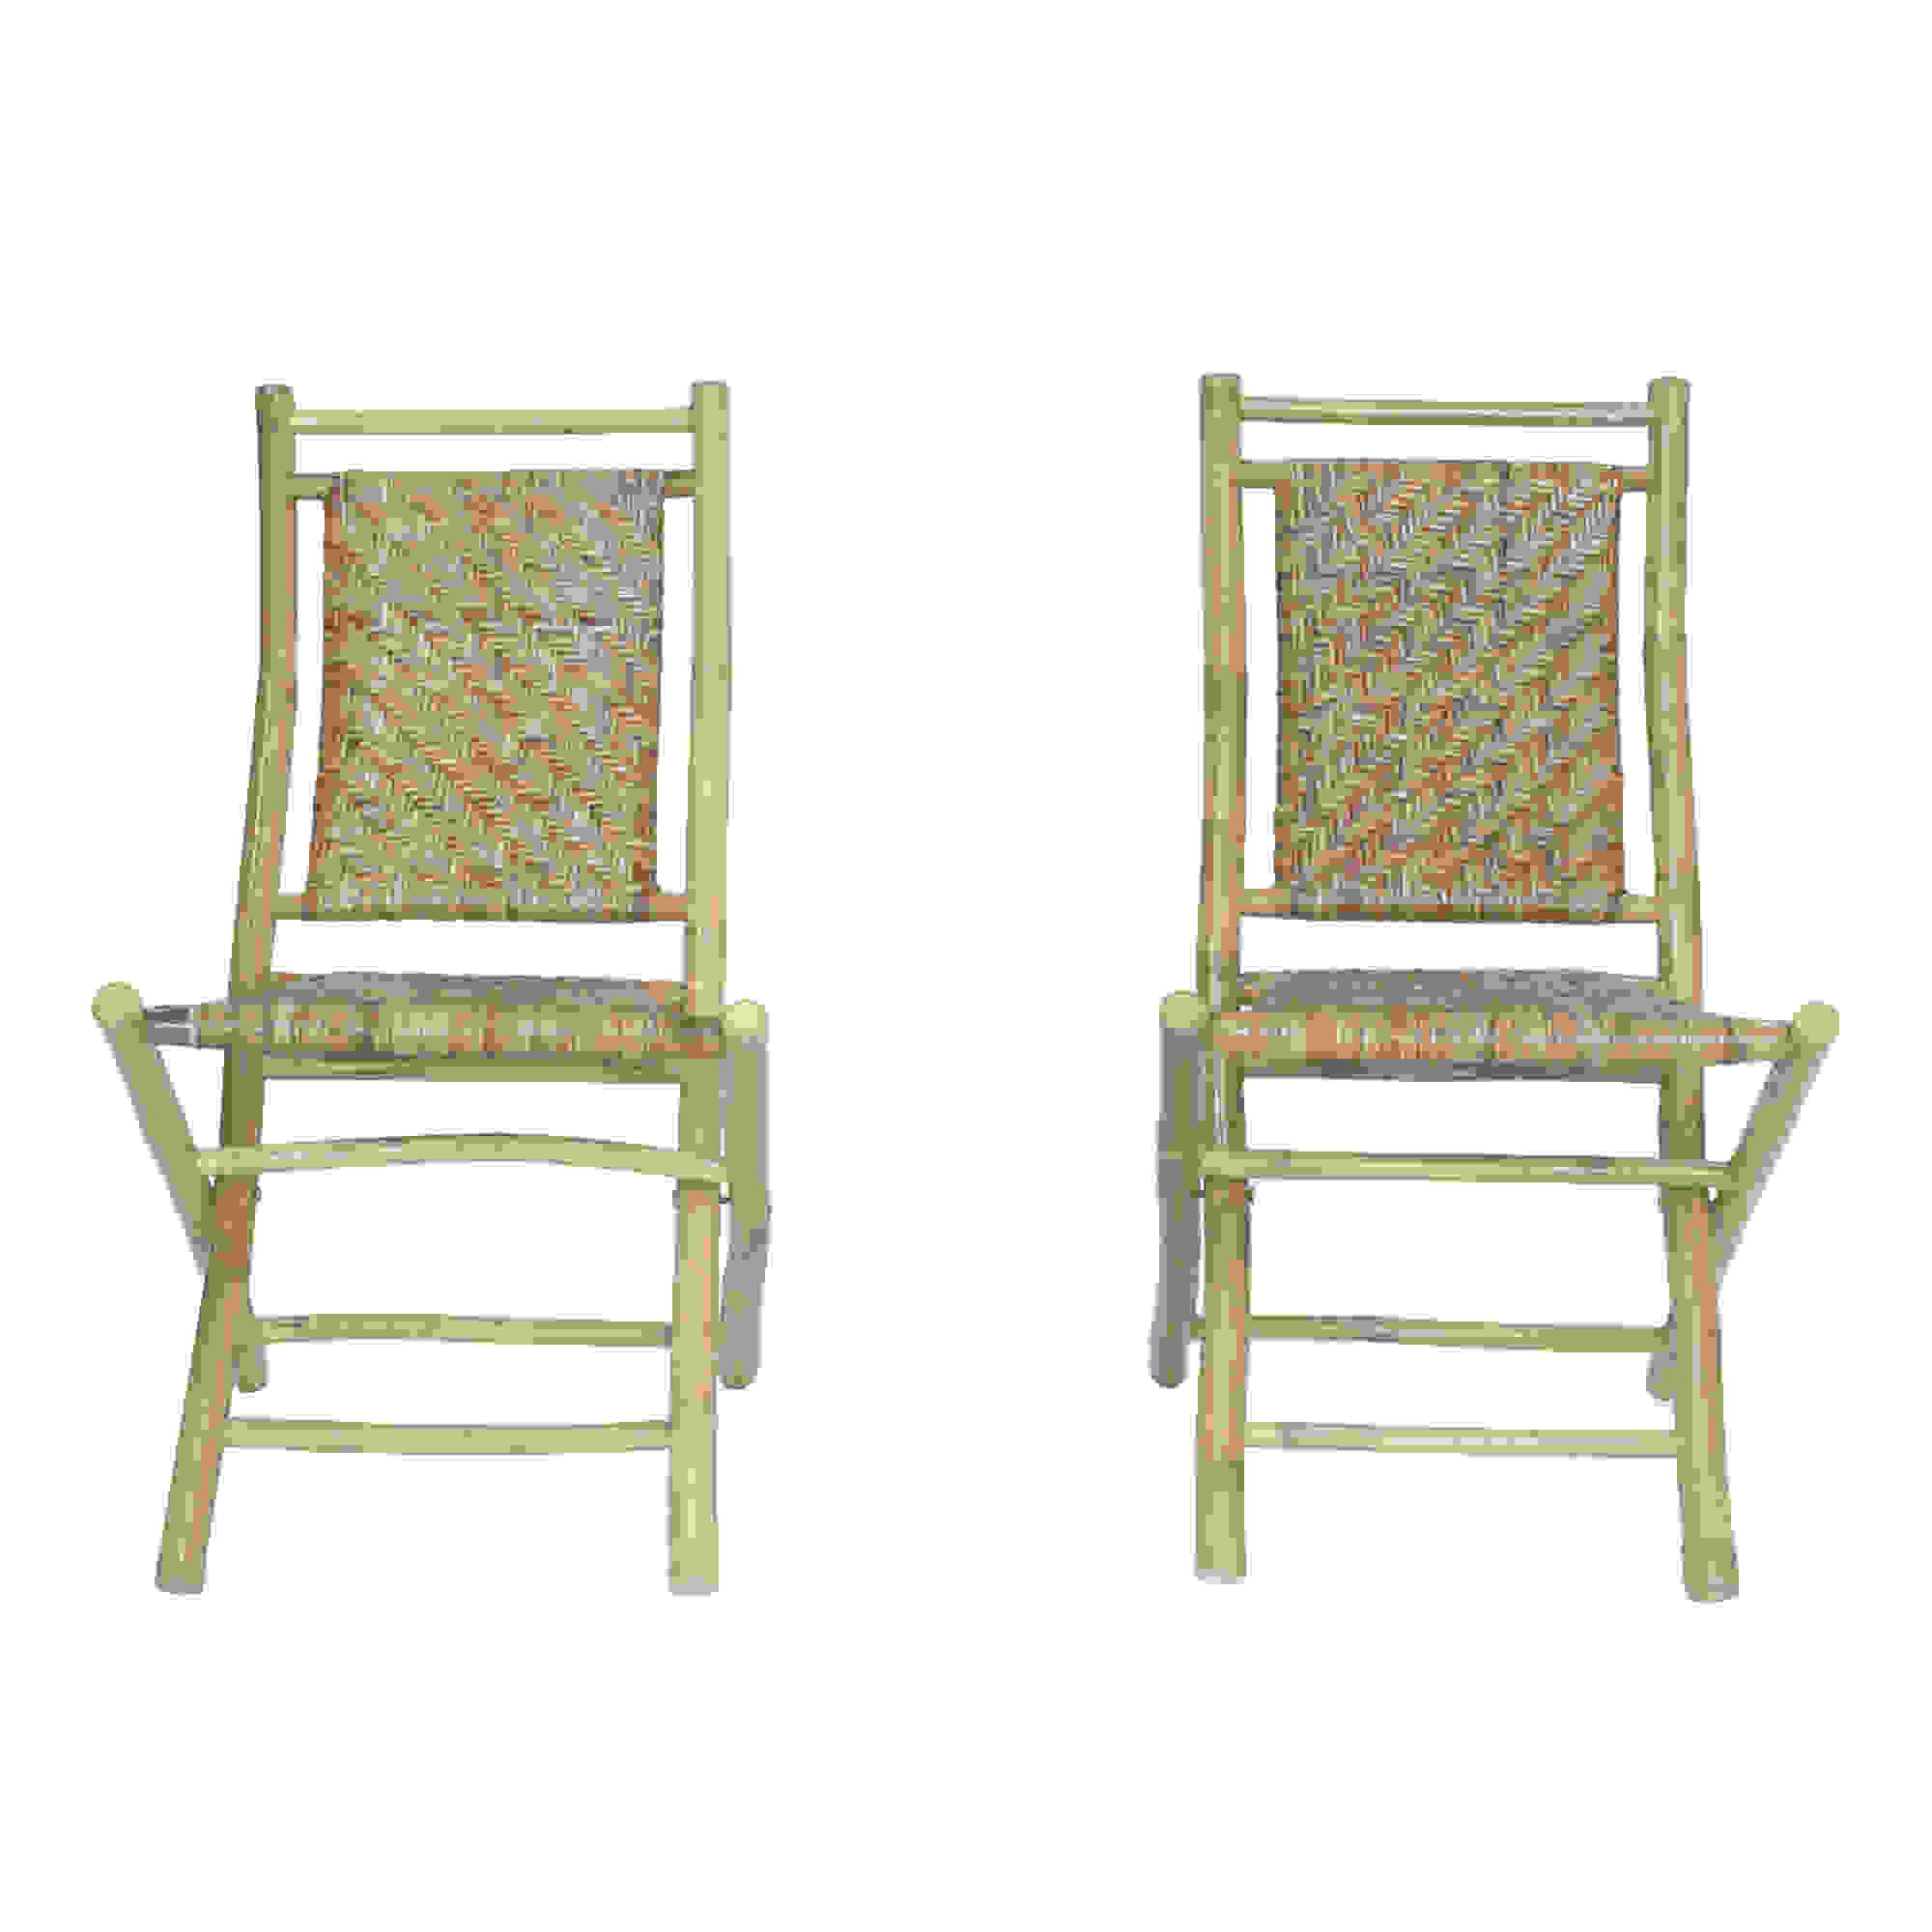 "20"" X 15"" X 36"" Brown Bamboo Folding Chair with a Rattan Skin Chevron Weave"